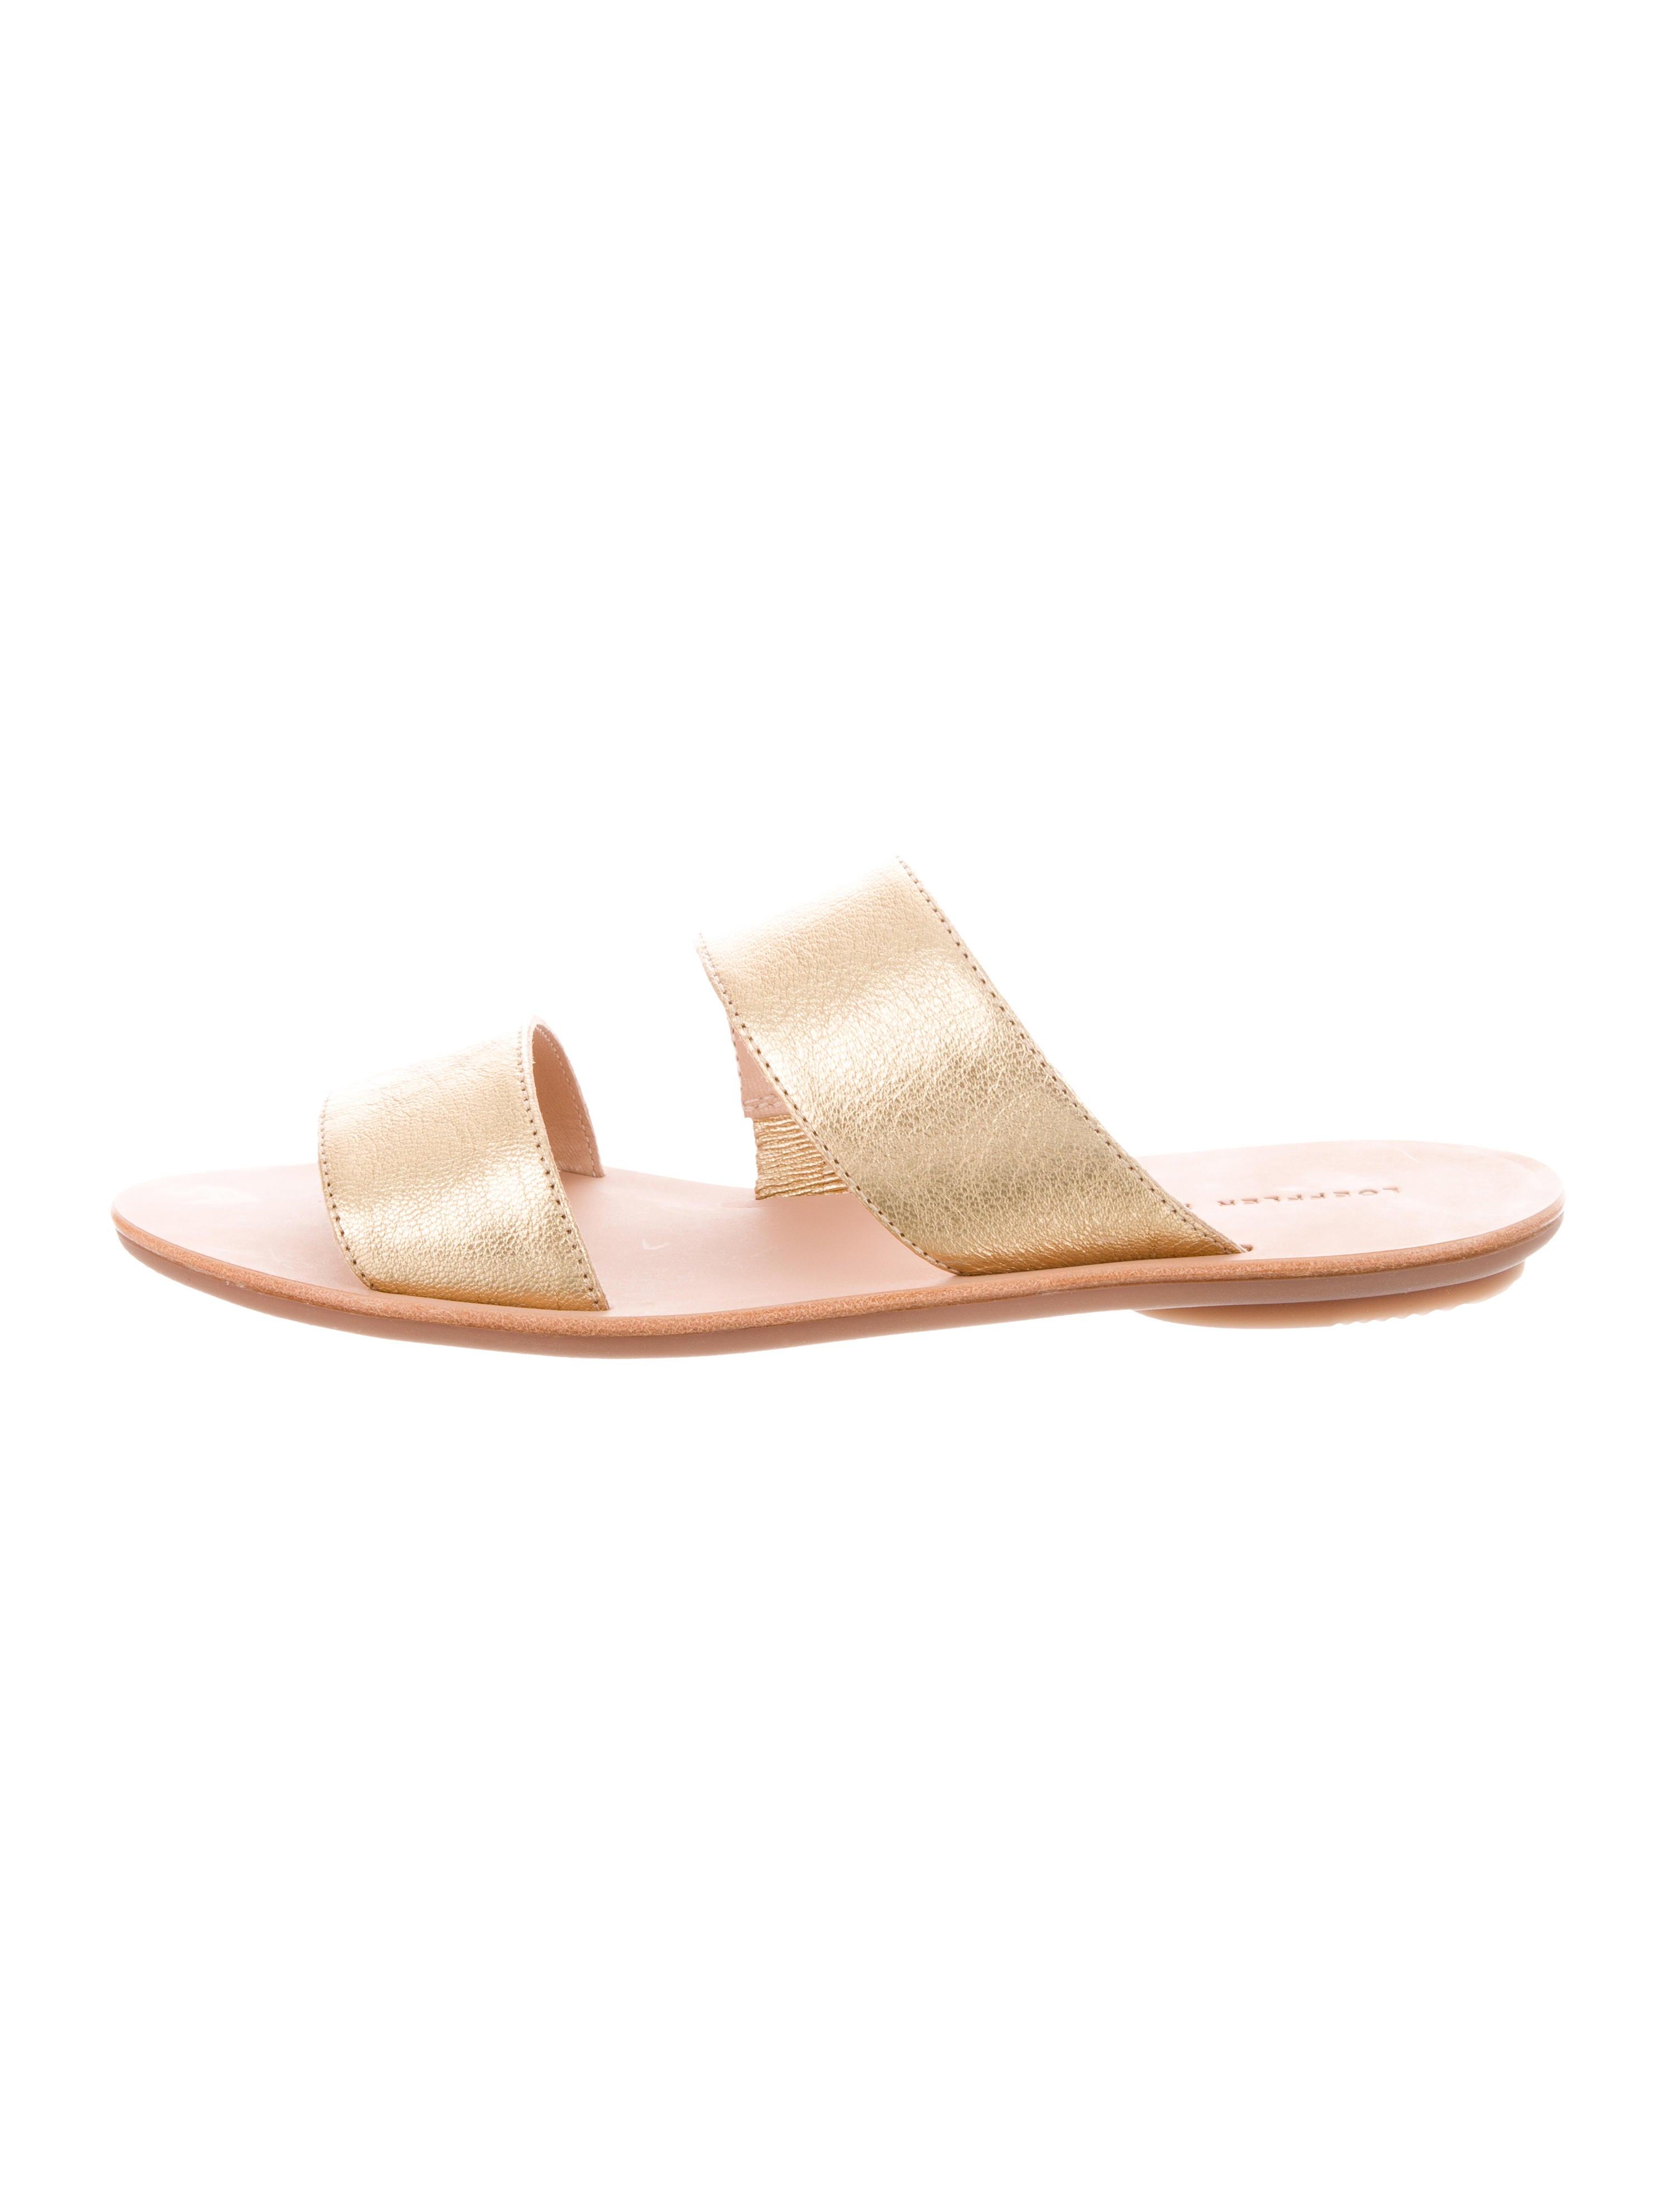 Loeffler Randall Clem Slide Sandals w/ Tags professional online yFjliIzm3Q